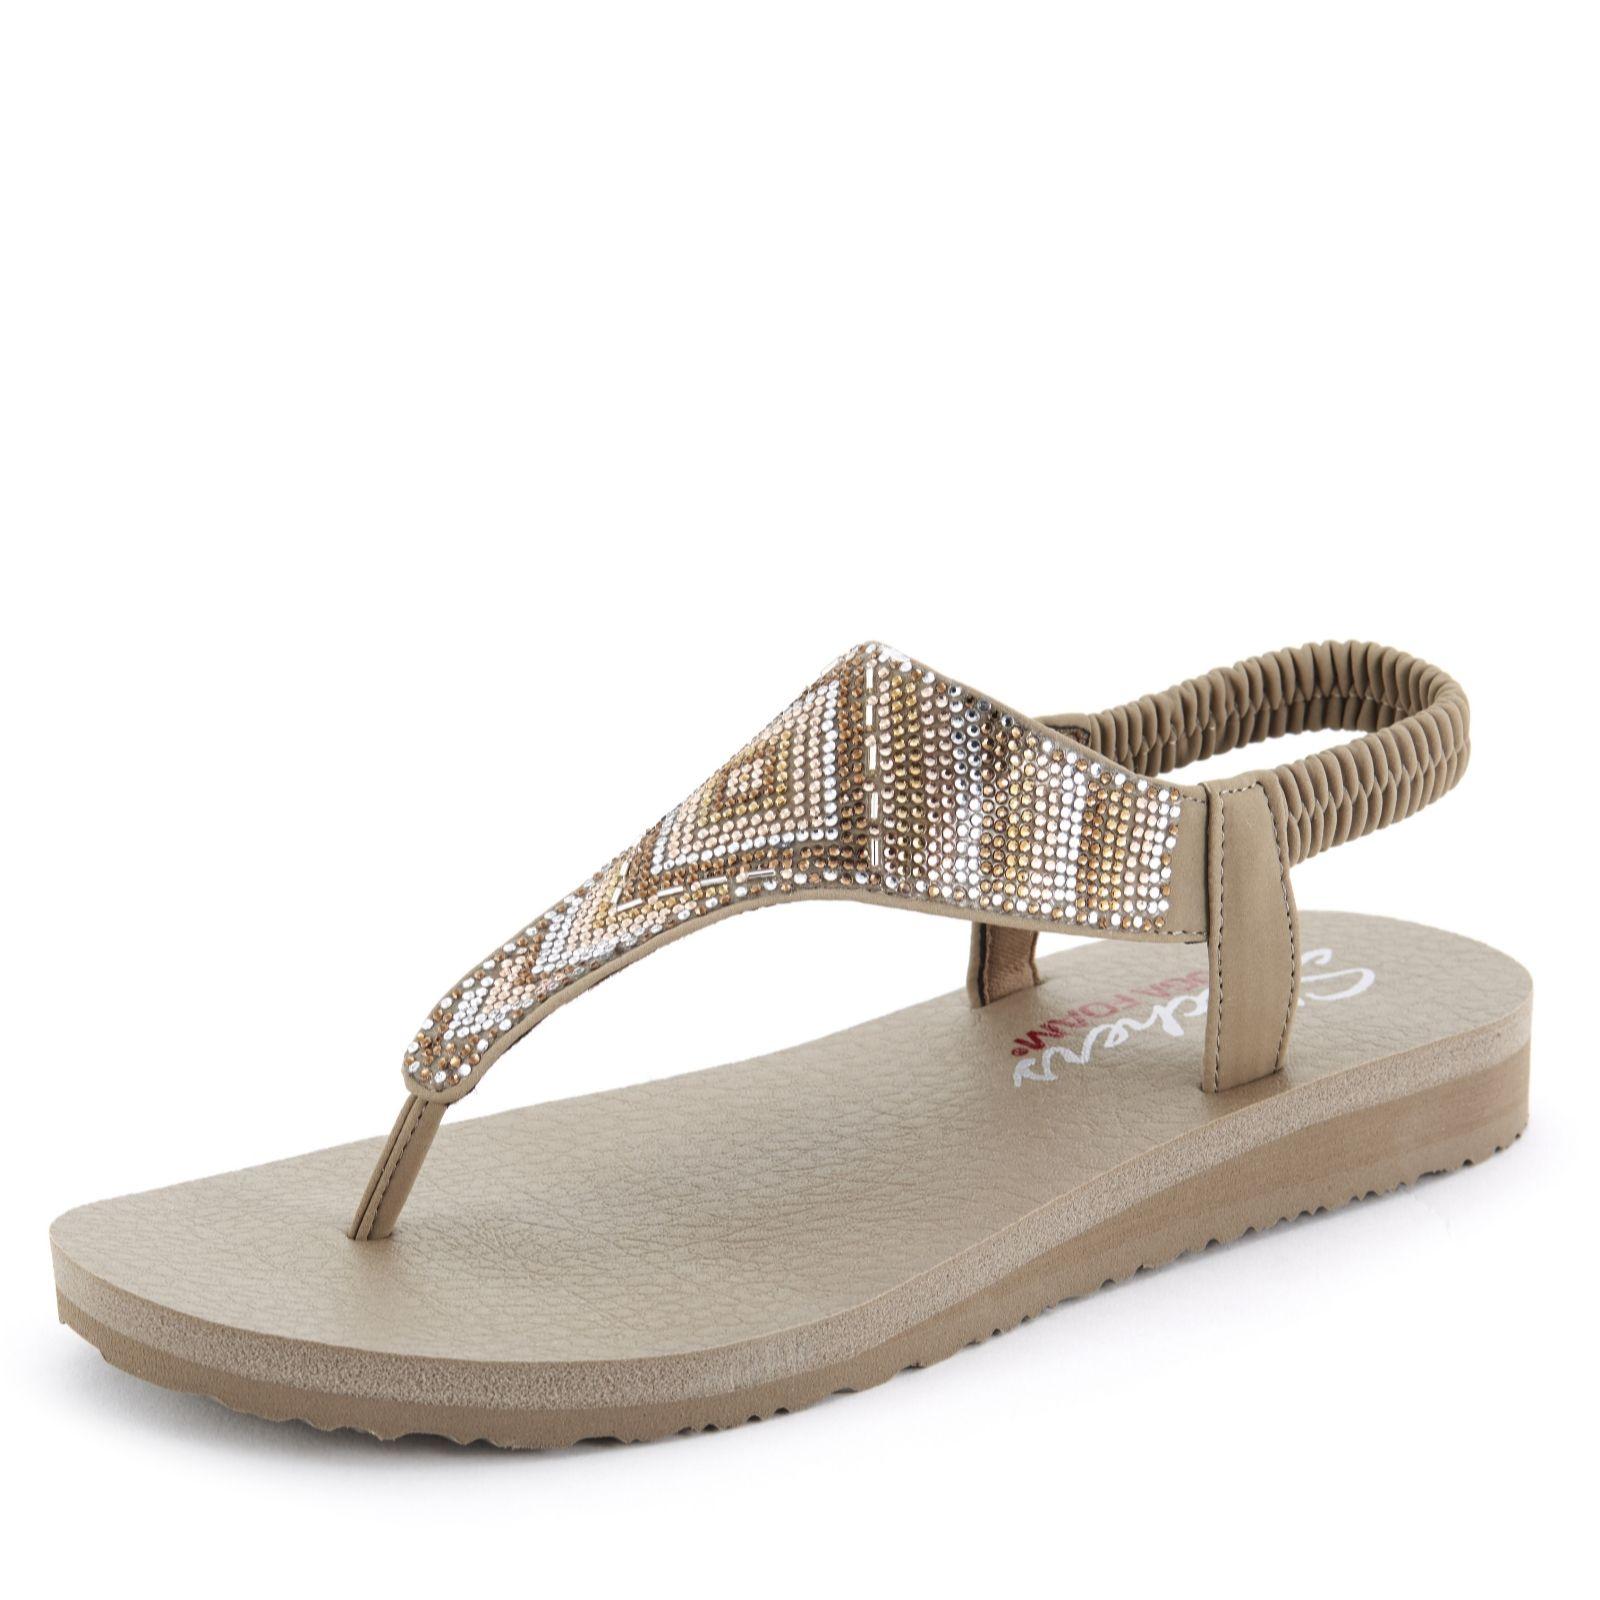 3f16a853c4e3 Skechers Meditation Gypsy Glam Aztec Rhinestone Sling Back Sandal ...